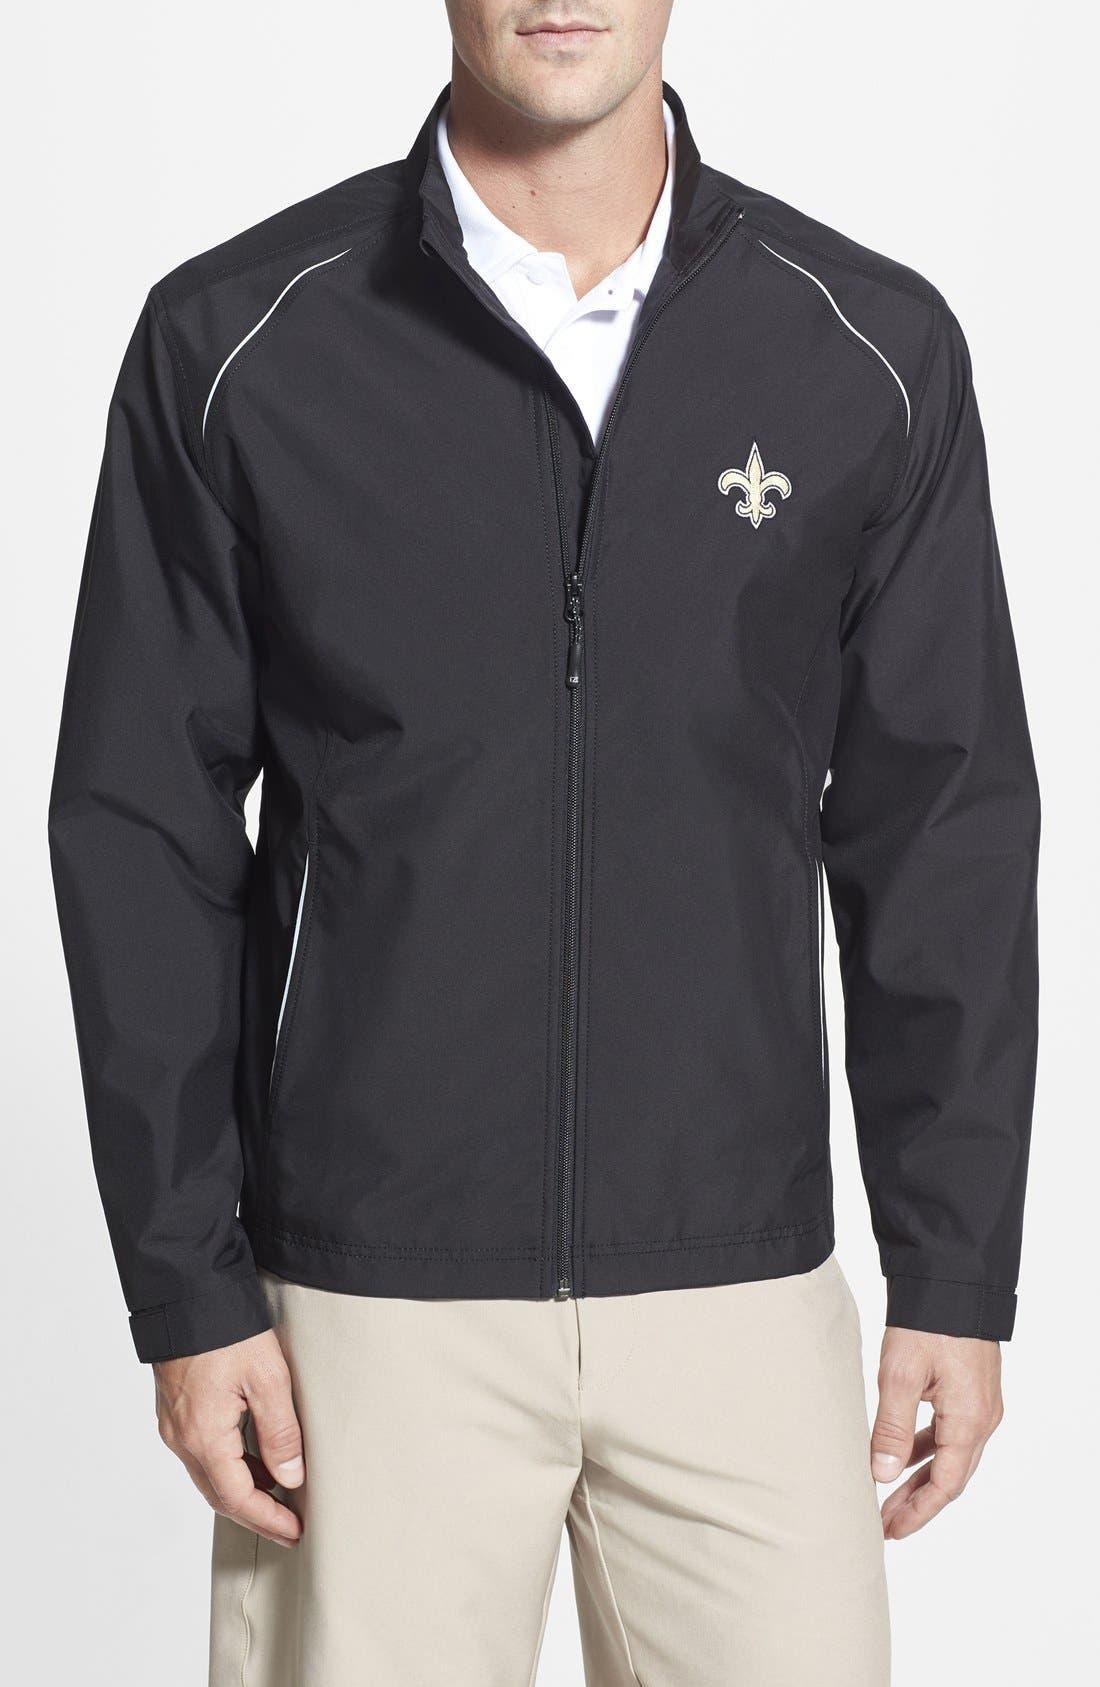 New Orleans Saints - Beacon WeatherTec Wind & Water Resistant Jacket,                             Main thumbnail 1, color,                             001